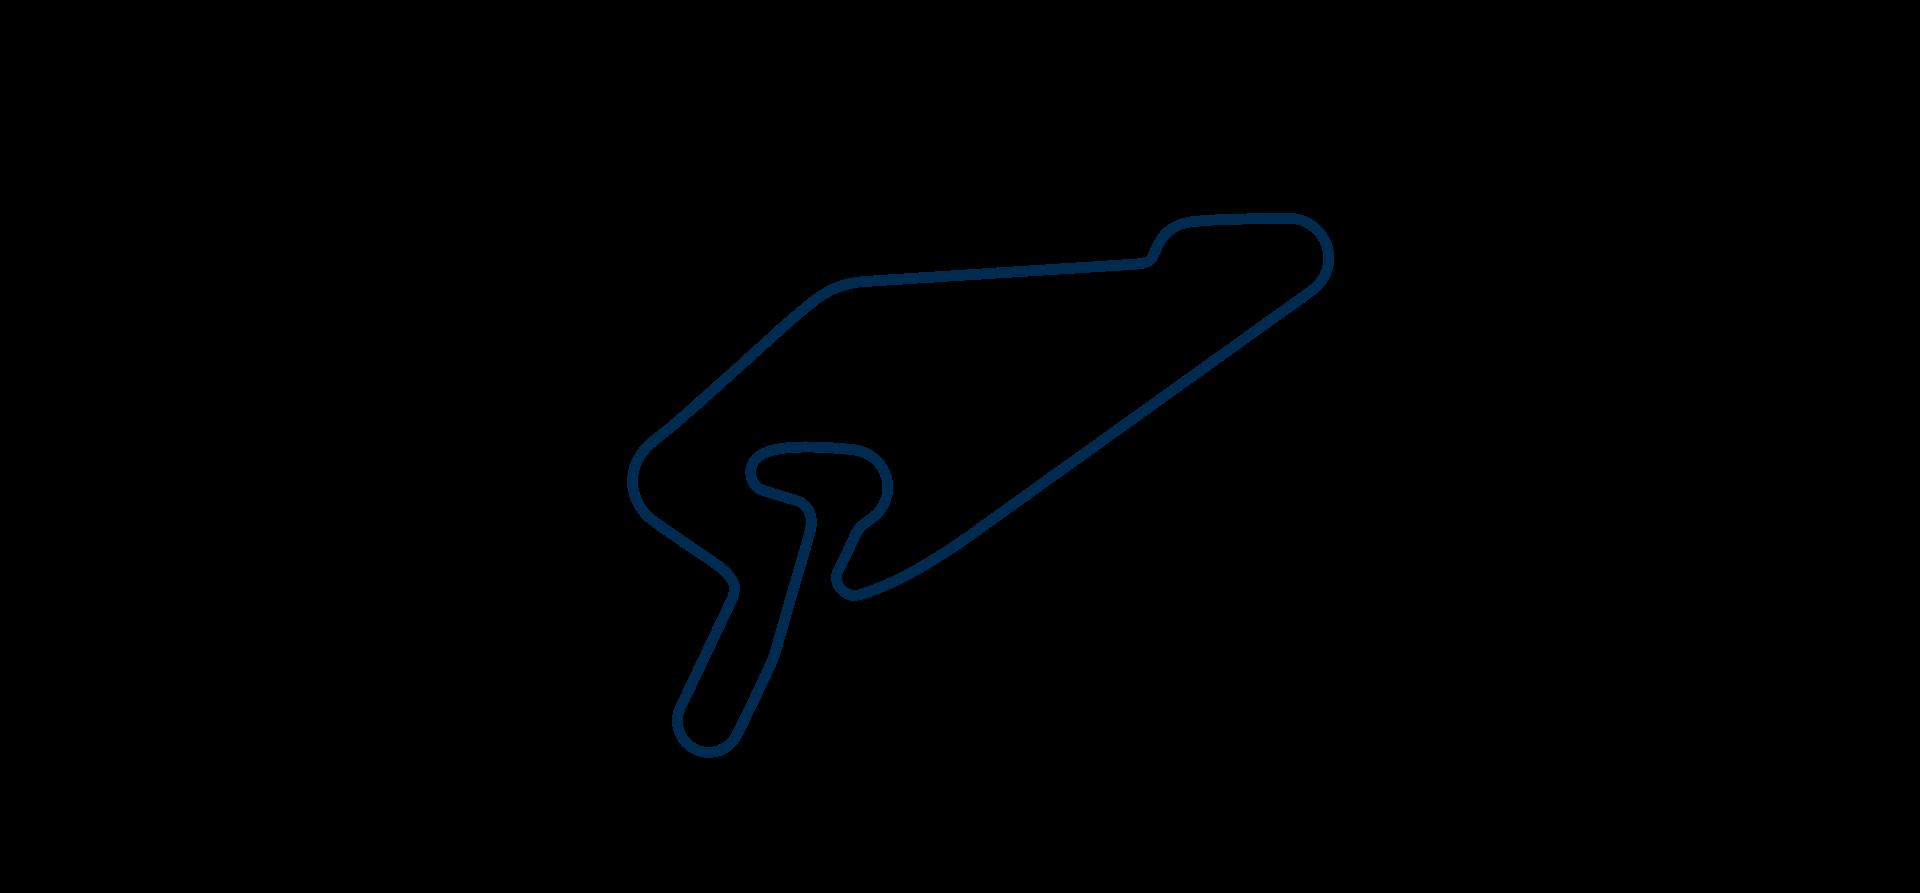 Nurburgring (Sprint) Circuit